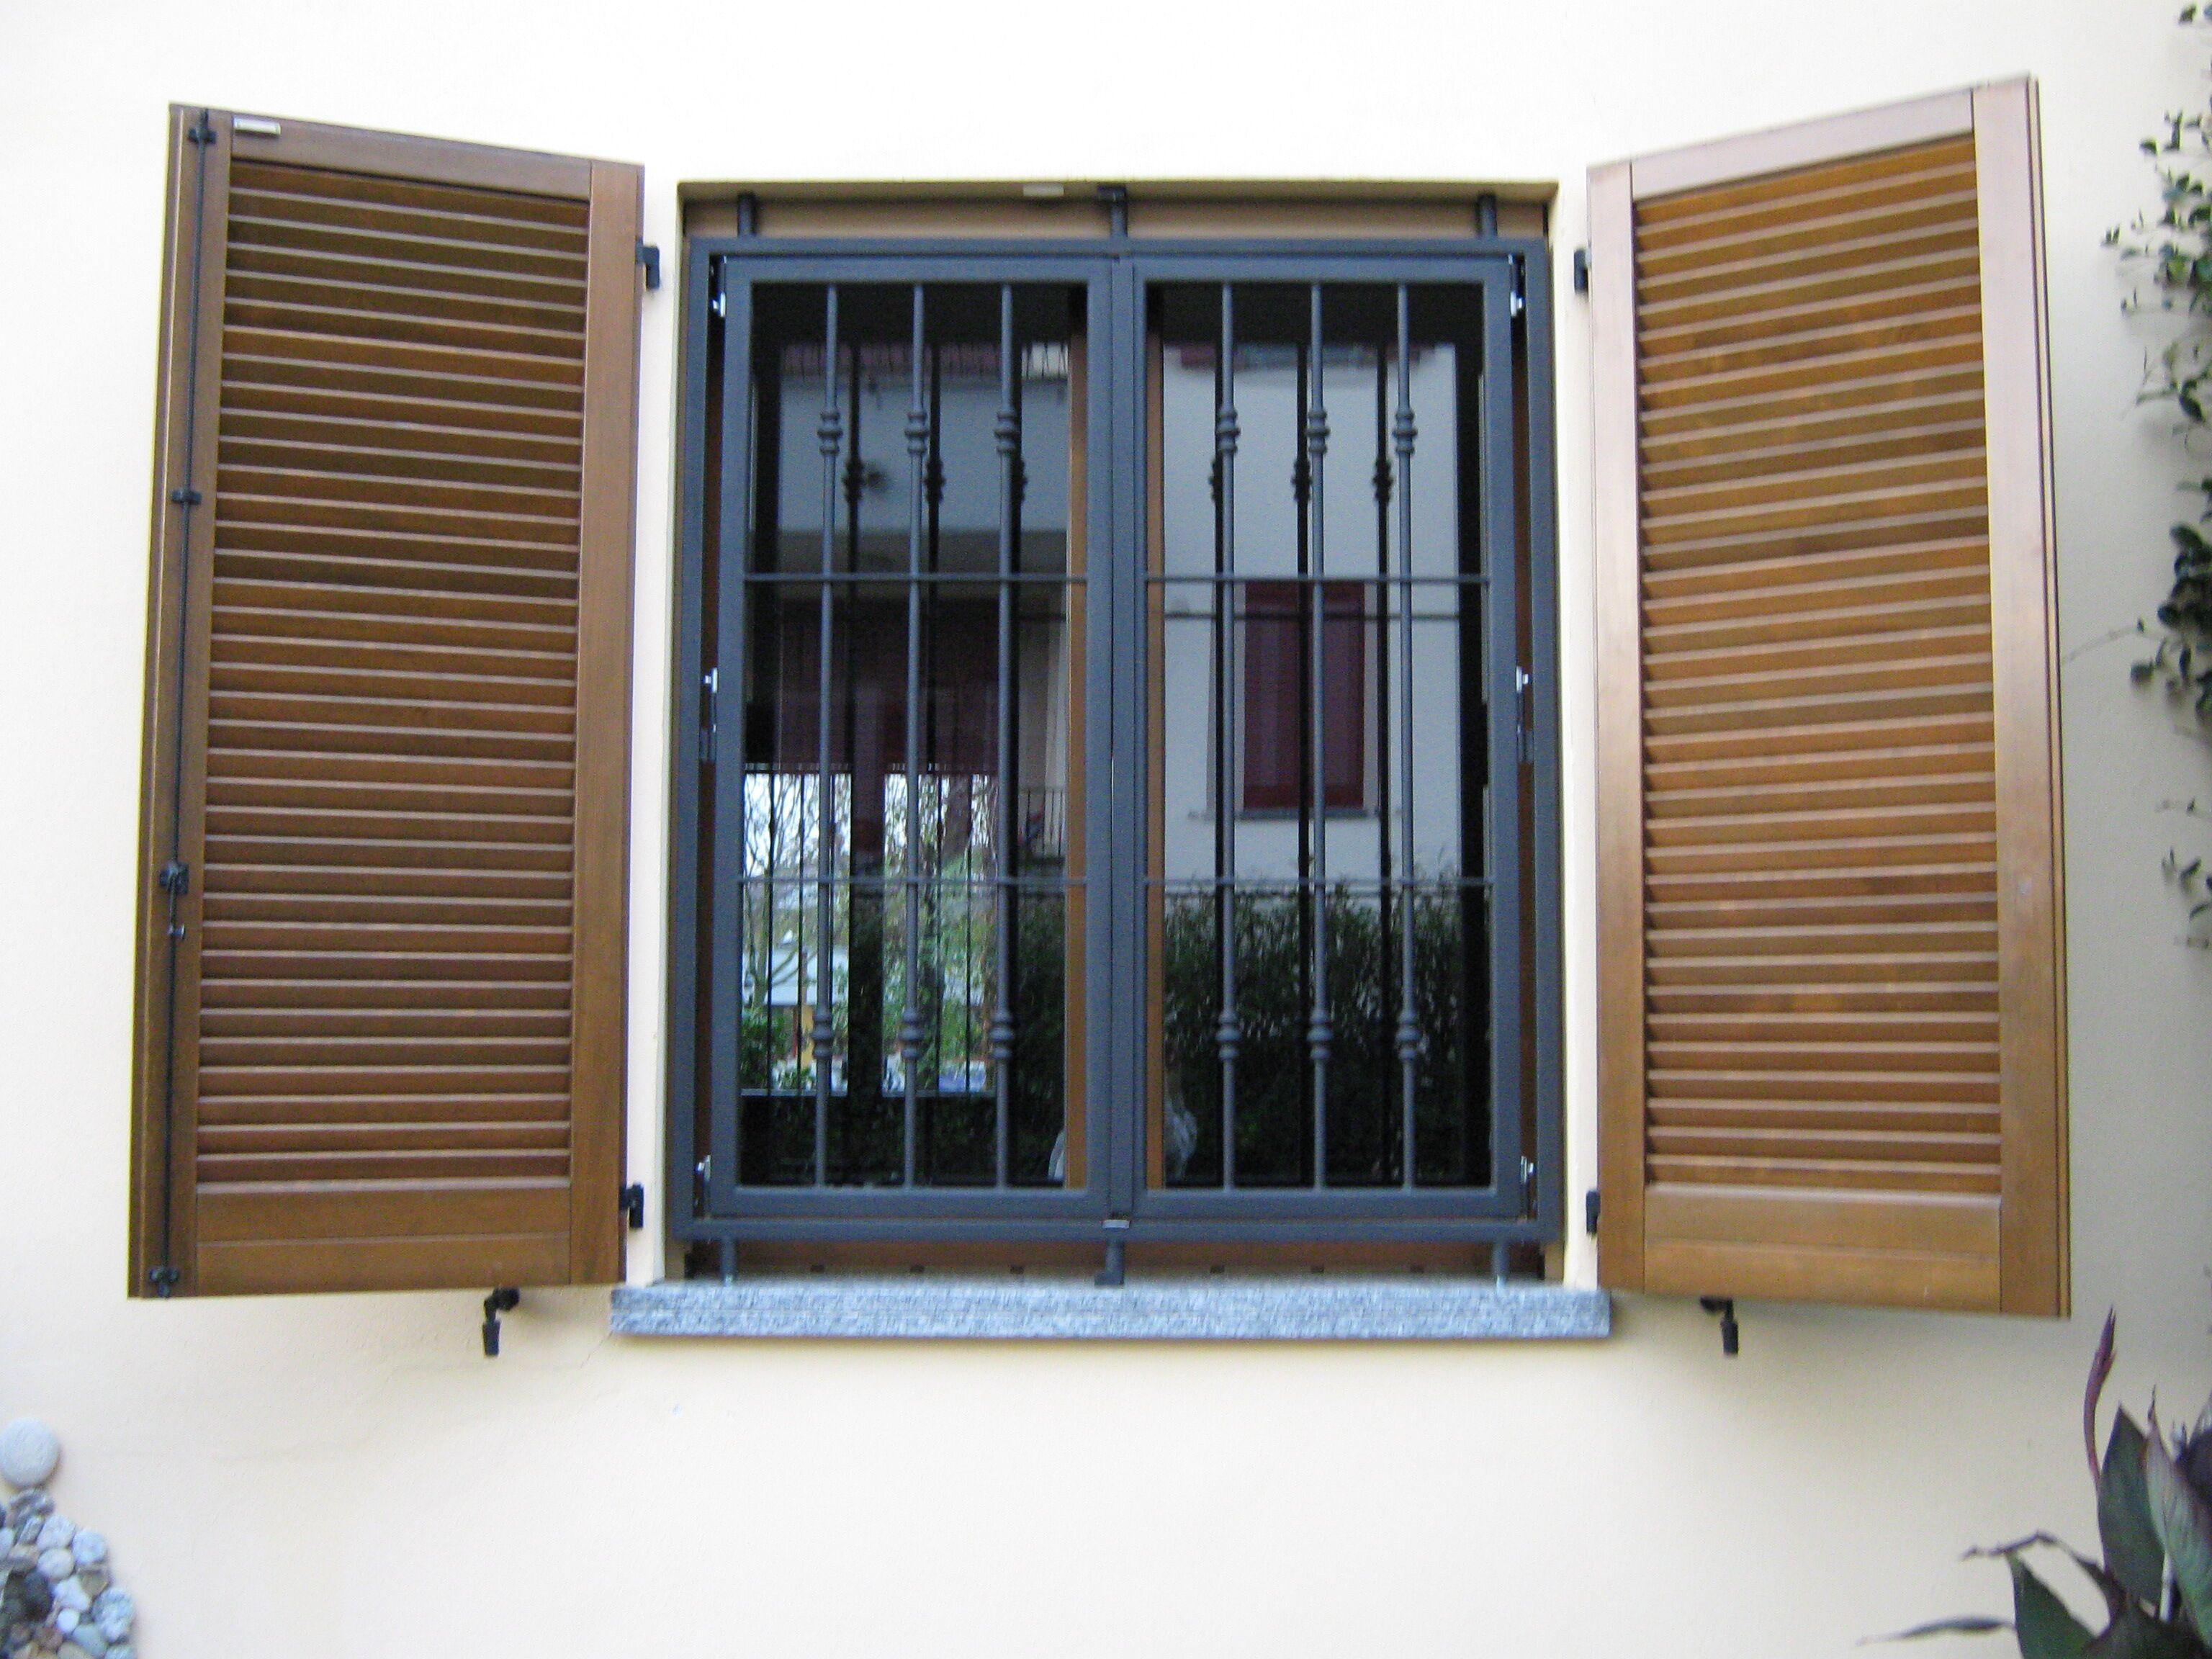 Sicurezza archivi gi ma - Grate di sicurezza per finestre prezzi ...